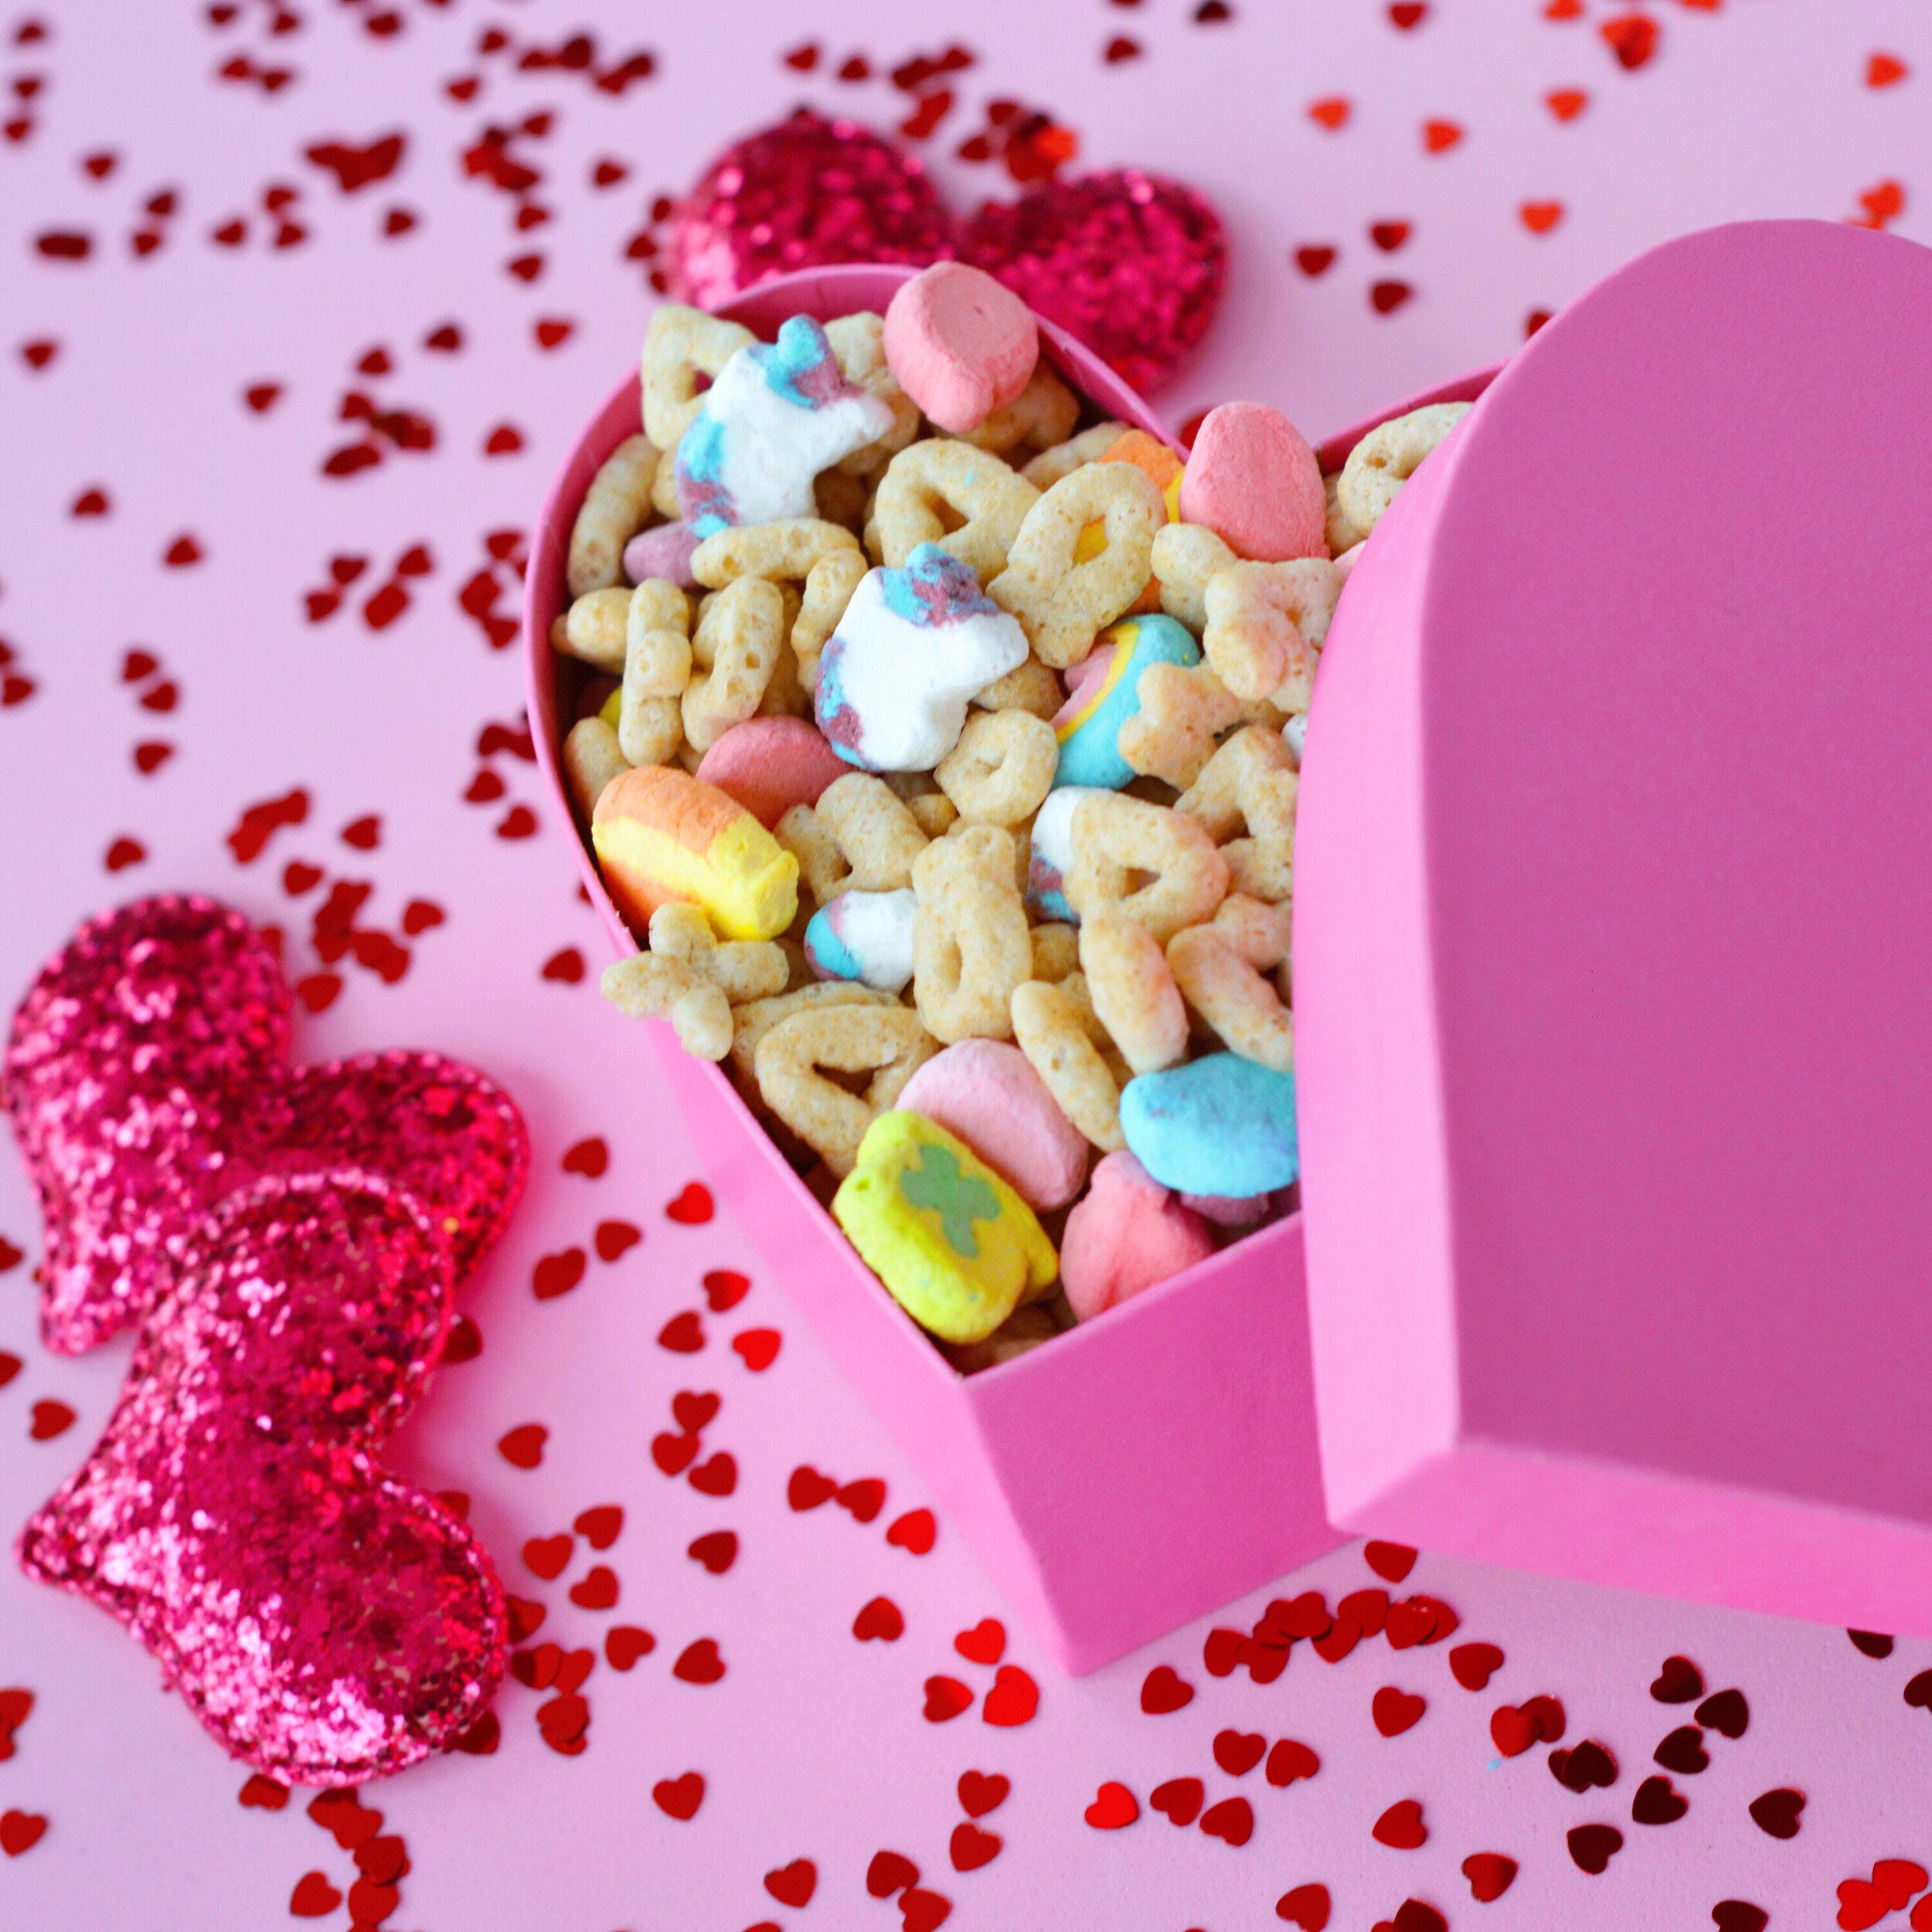 Lucky_ValentinesDay